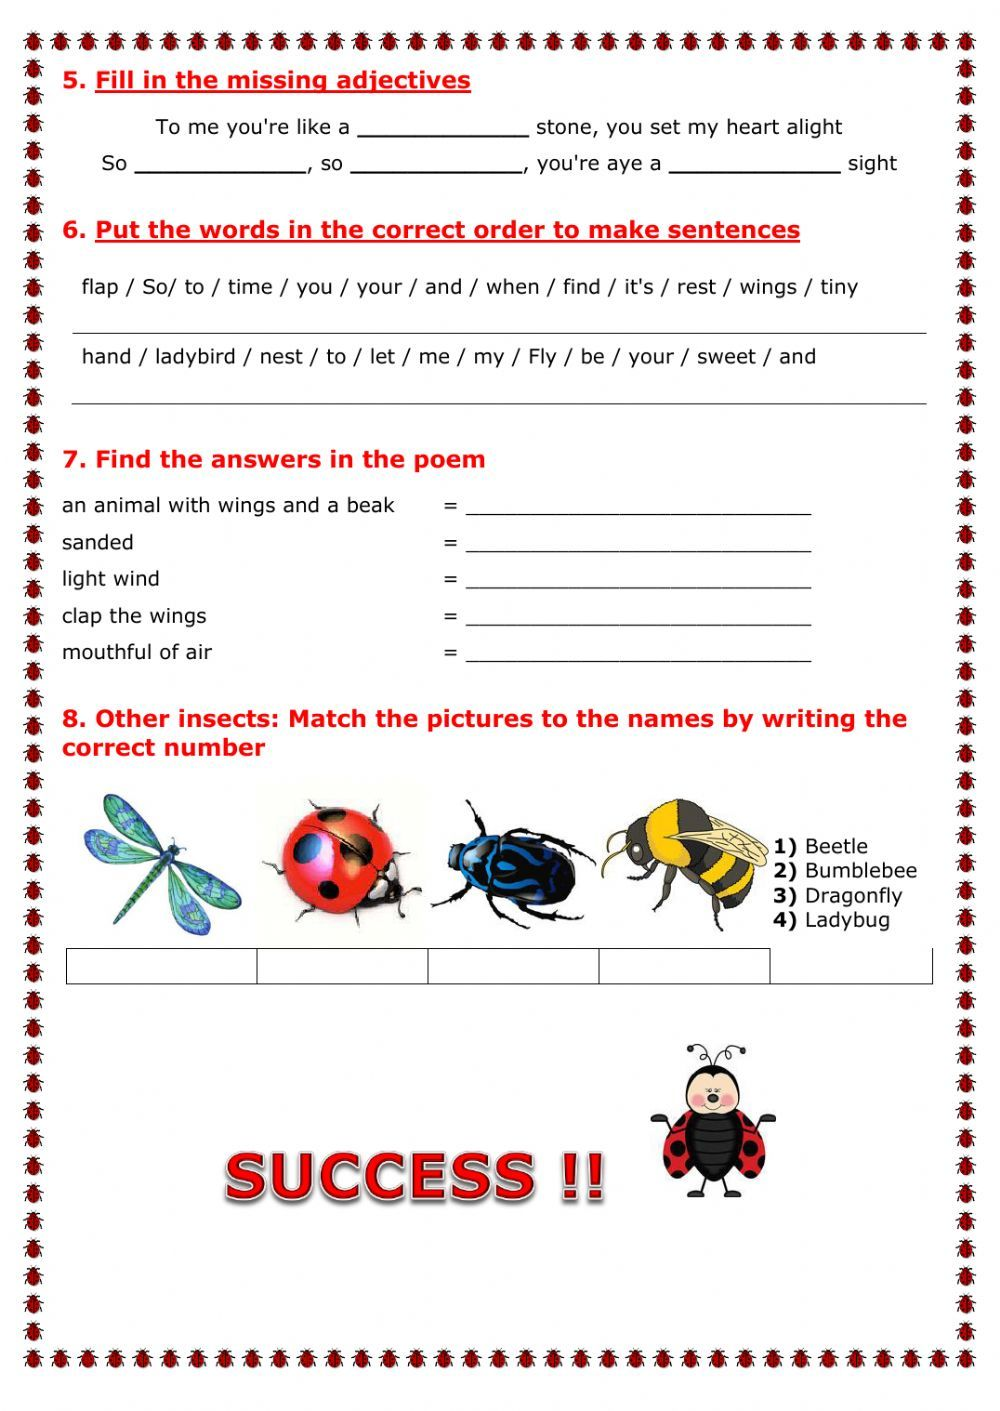 Ladybird Interactive Worksheet English As A Second Language Esl English As A Second Language Worksheets [ 1411 x 1000 Pixel ]